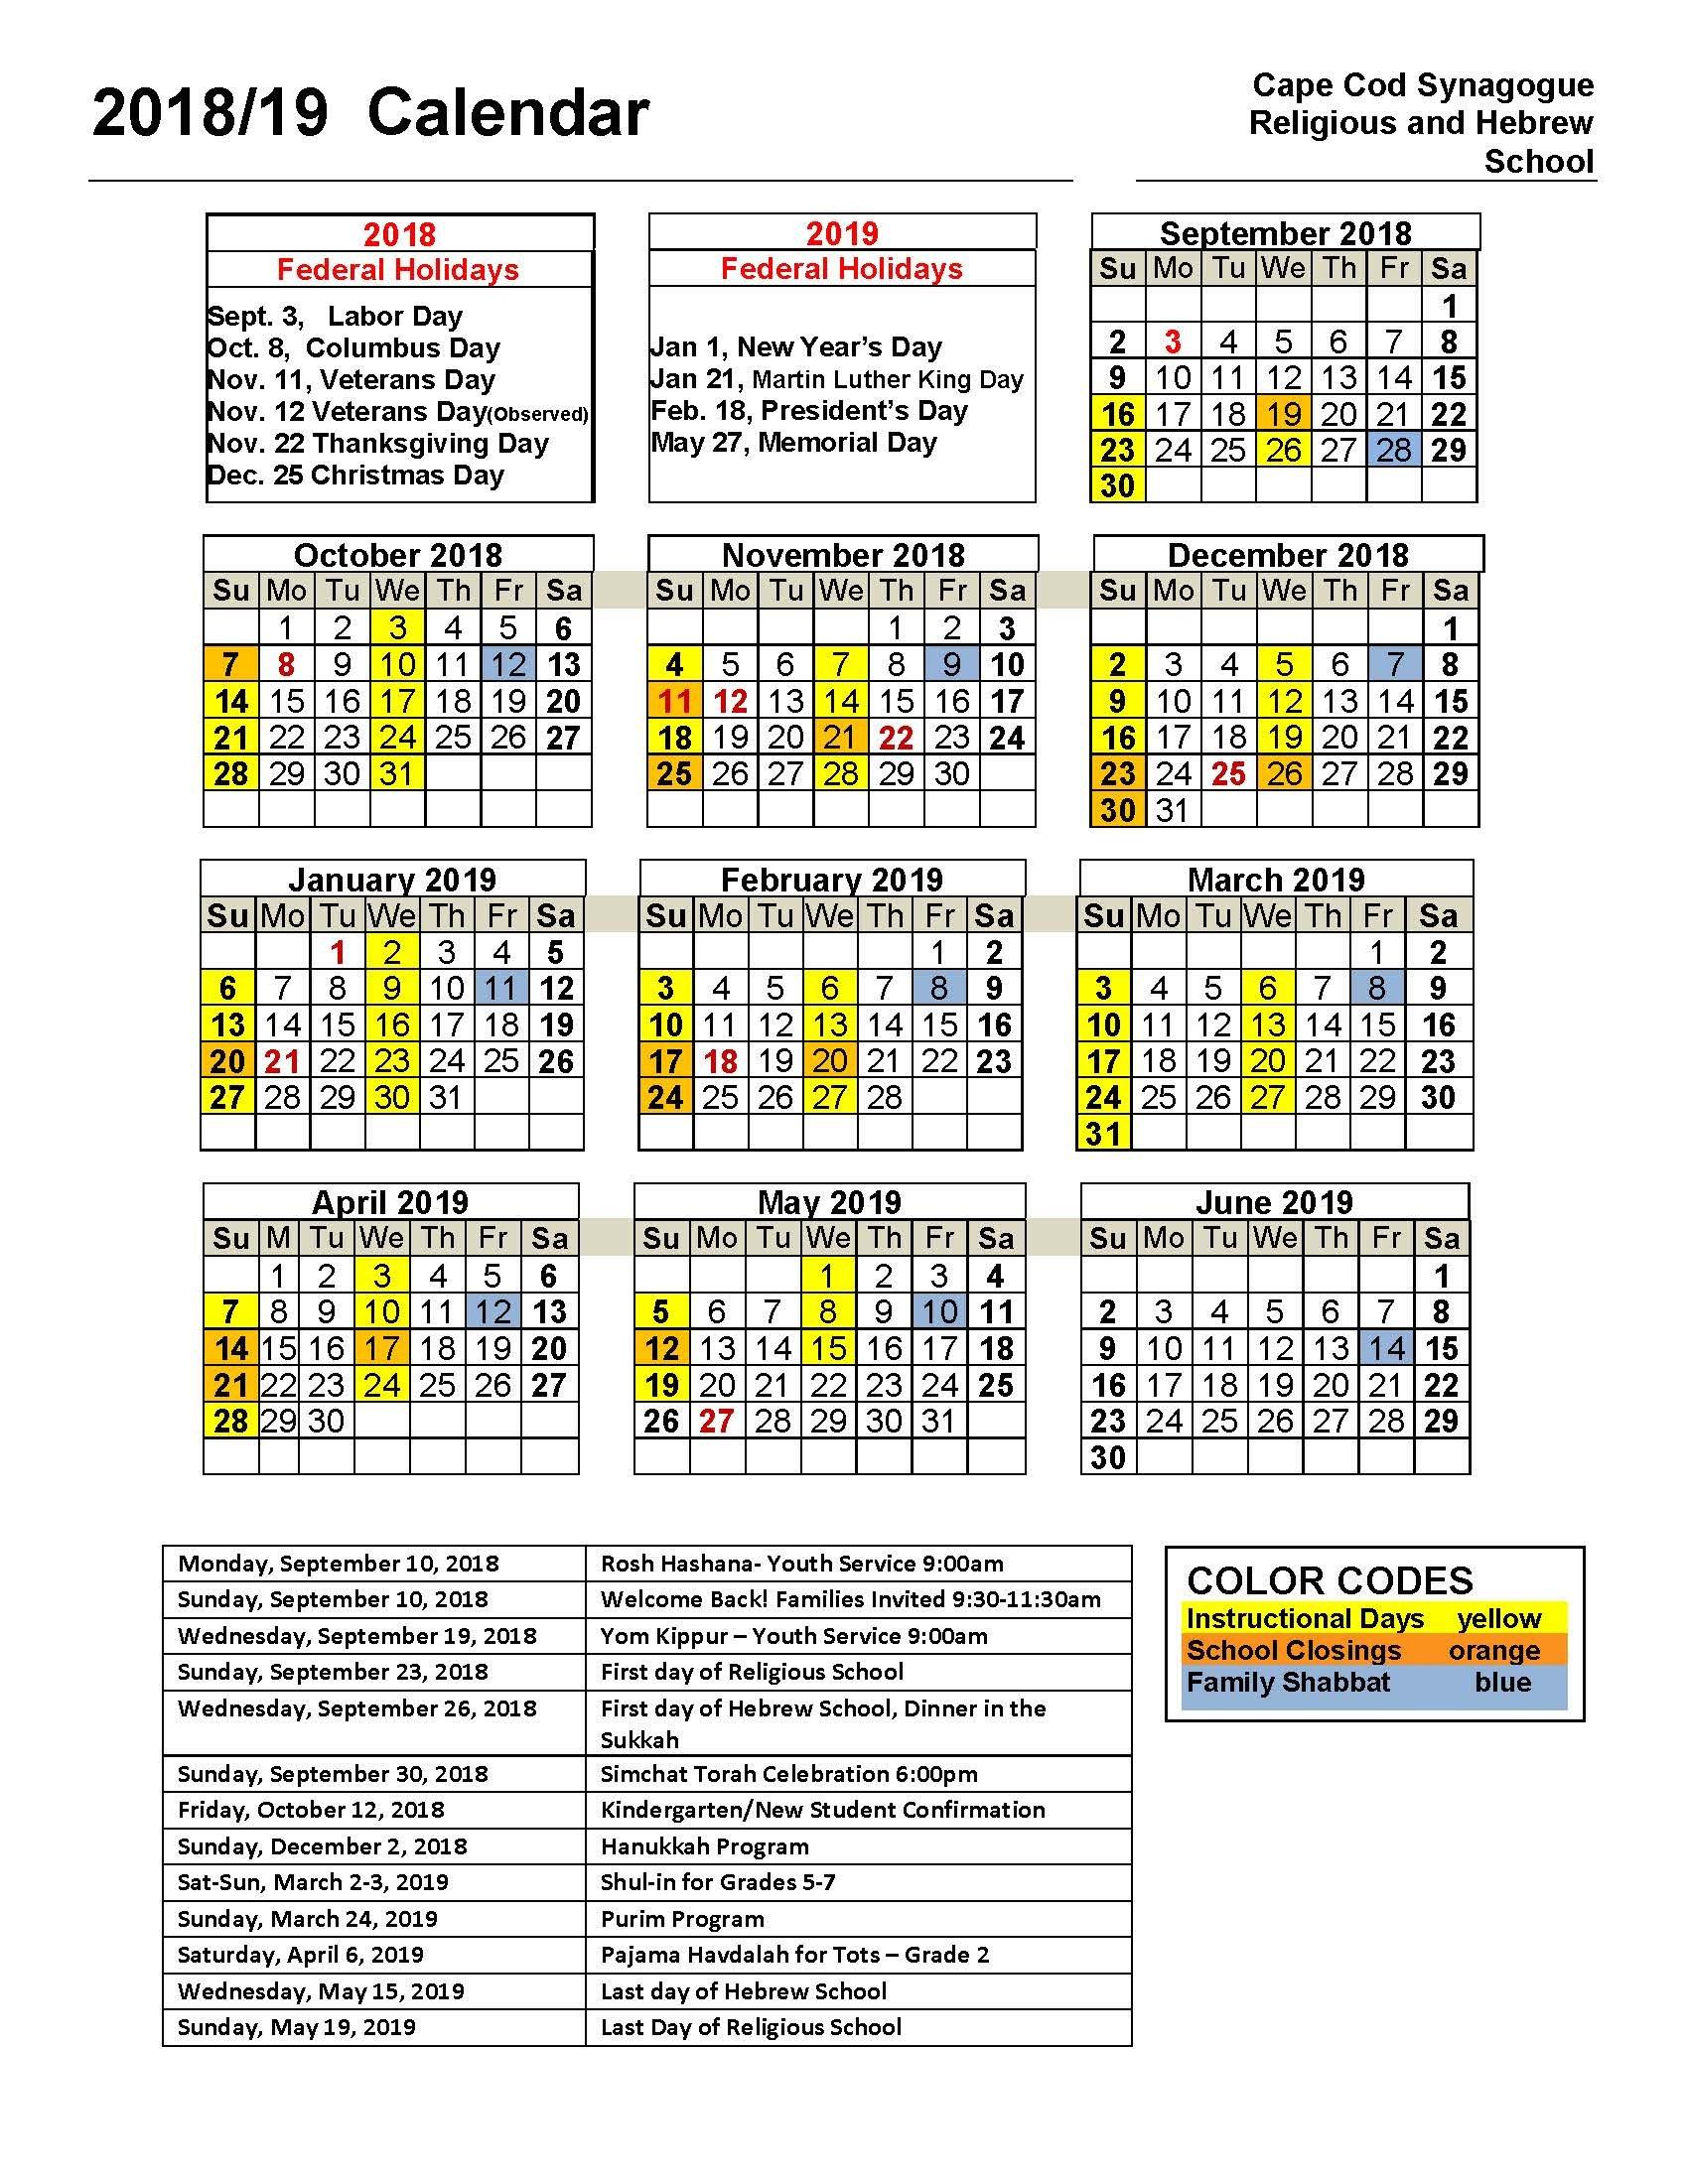 Religious And Hebrew School Calendar – Cape Cod Synagogue Calendar 2019 Martin Luther King